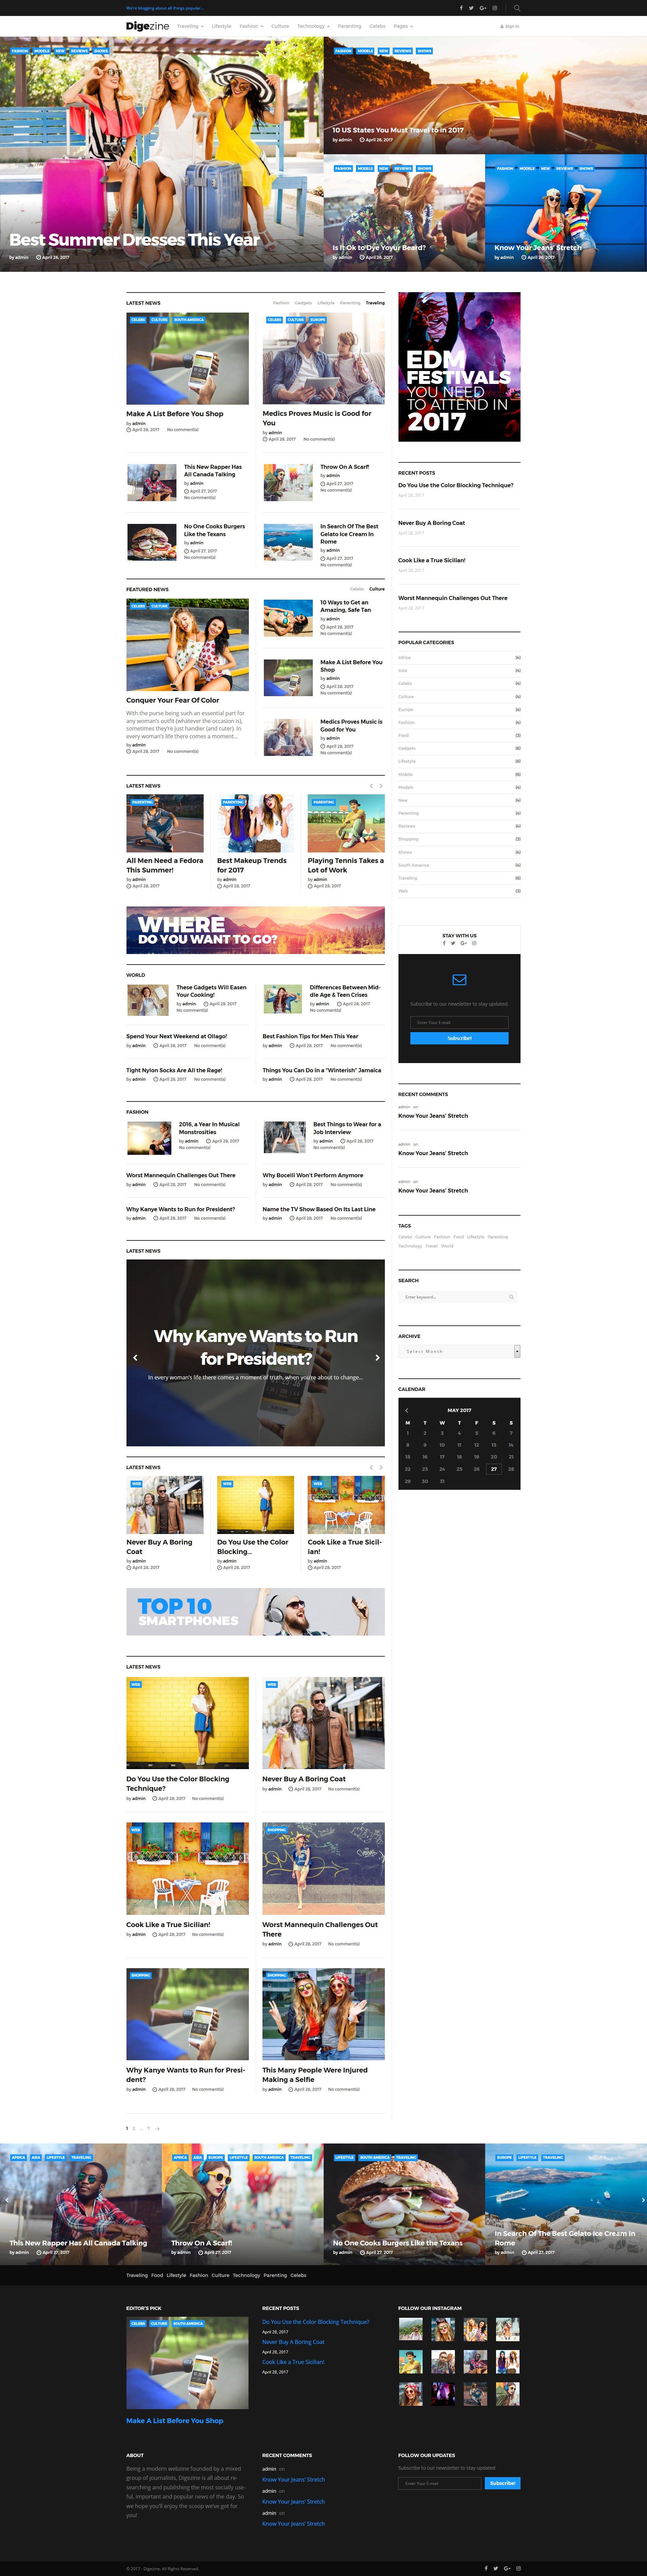 """Digezine - News Magazine"" - адаптивний WordPress шаблон №63850"